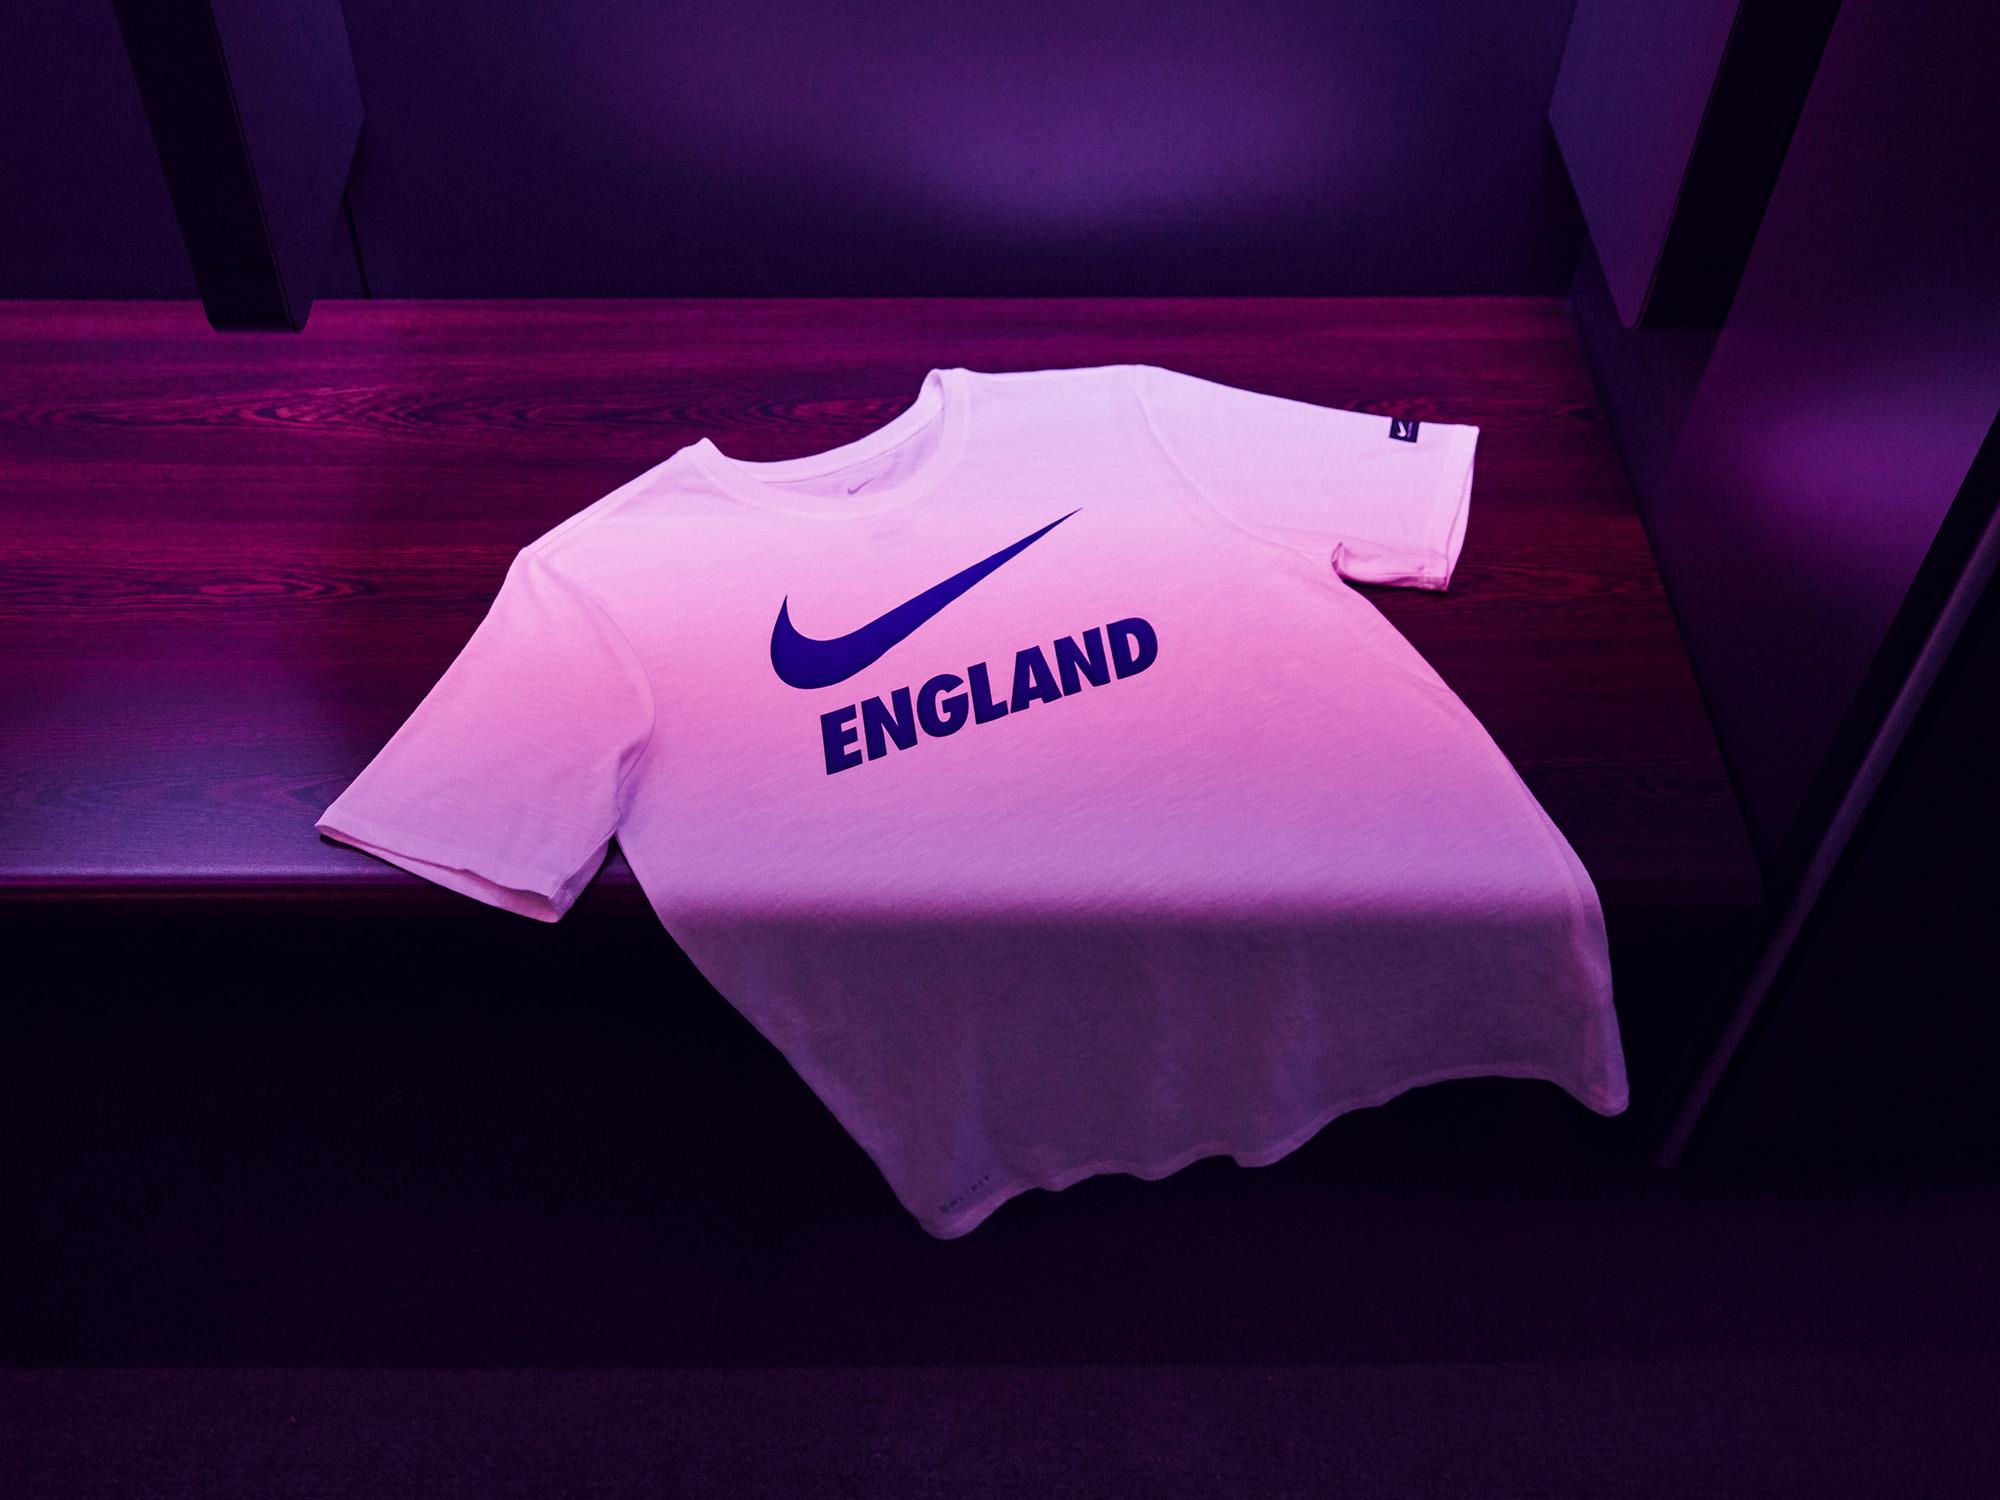 Nike-News-Football-Soccer-England-National-Team-Kit-14_77385